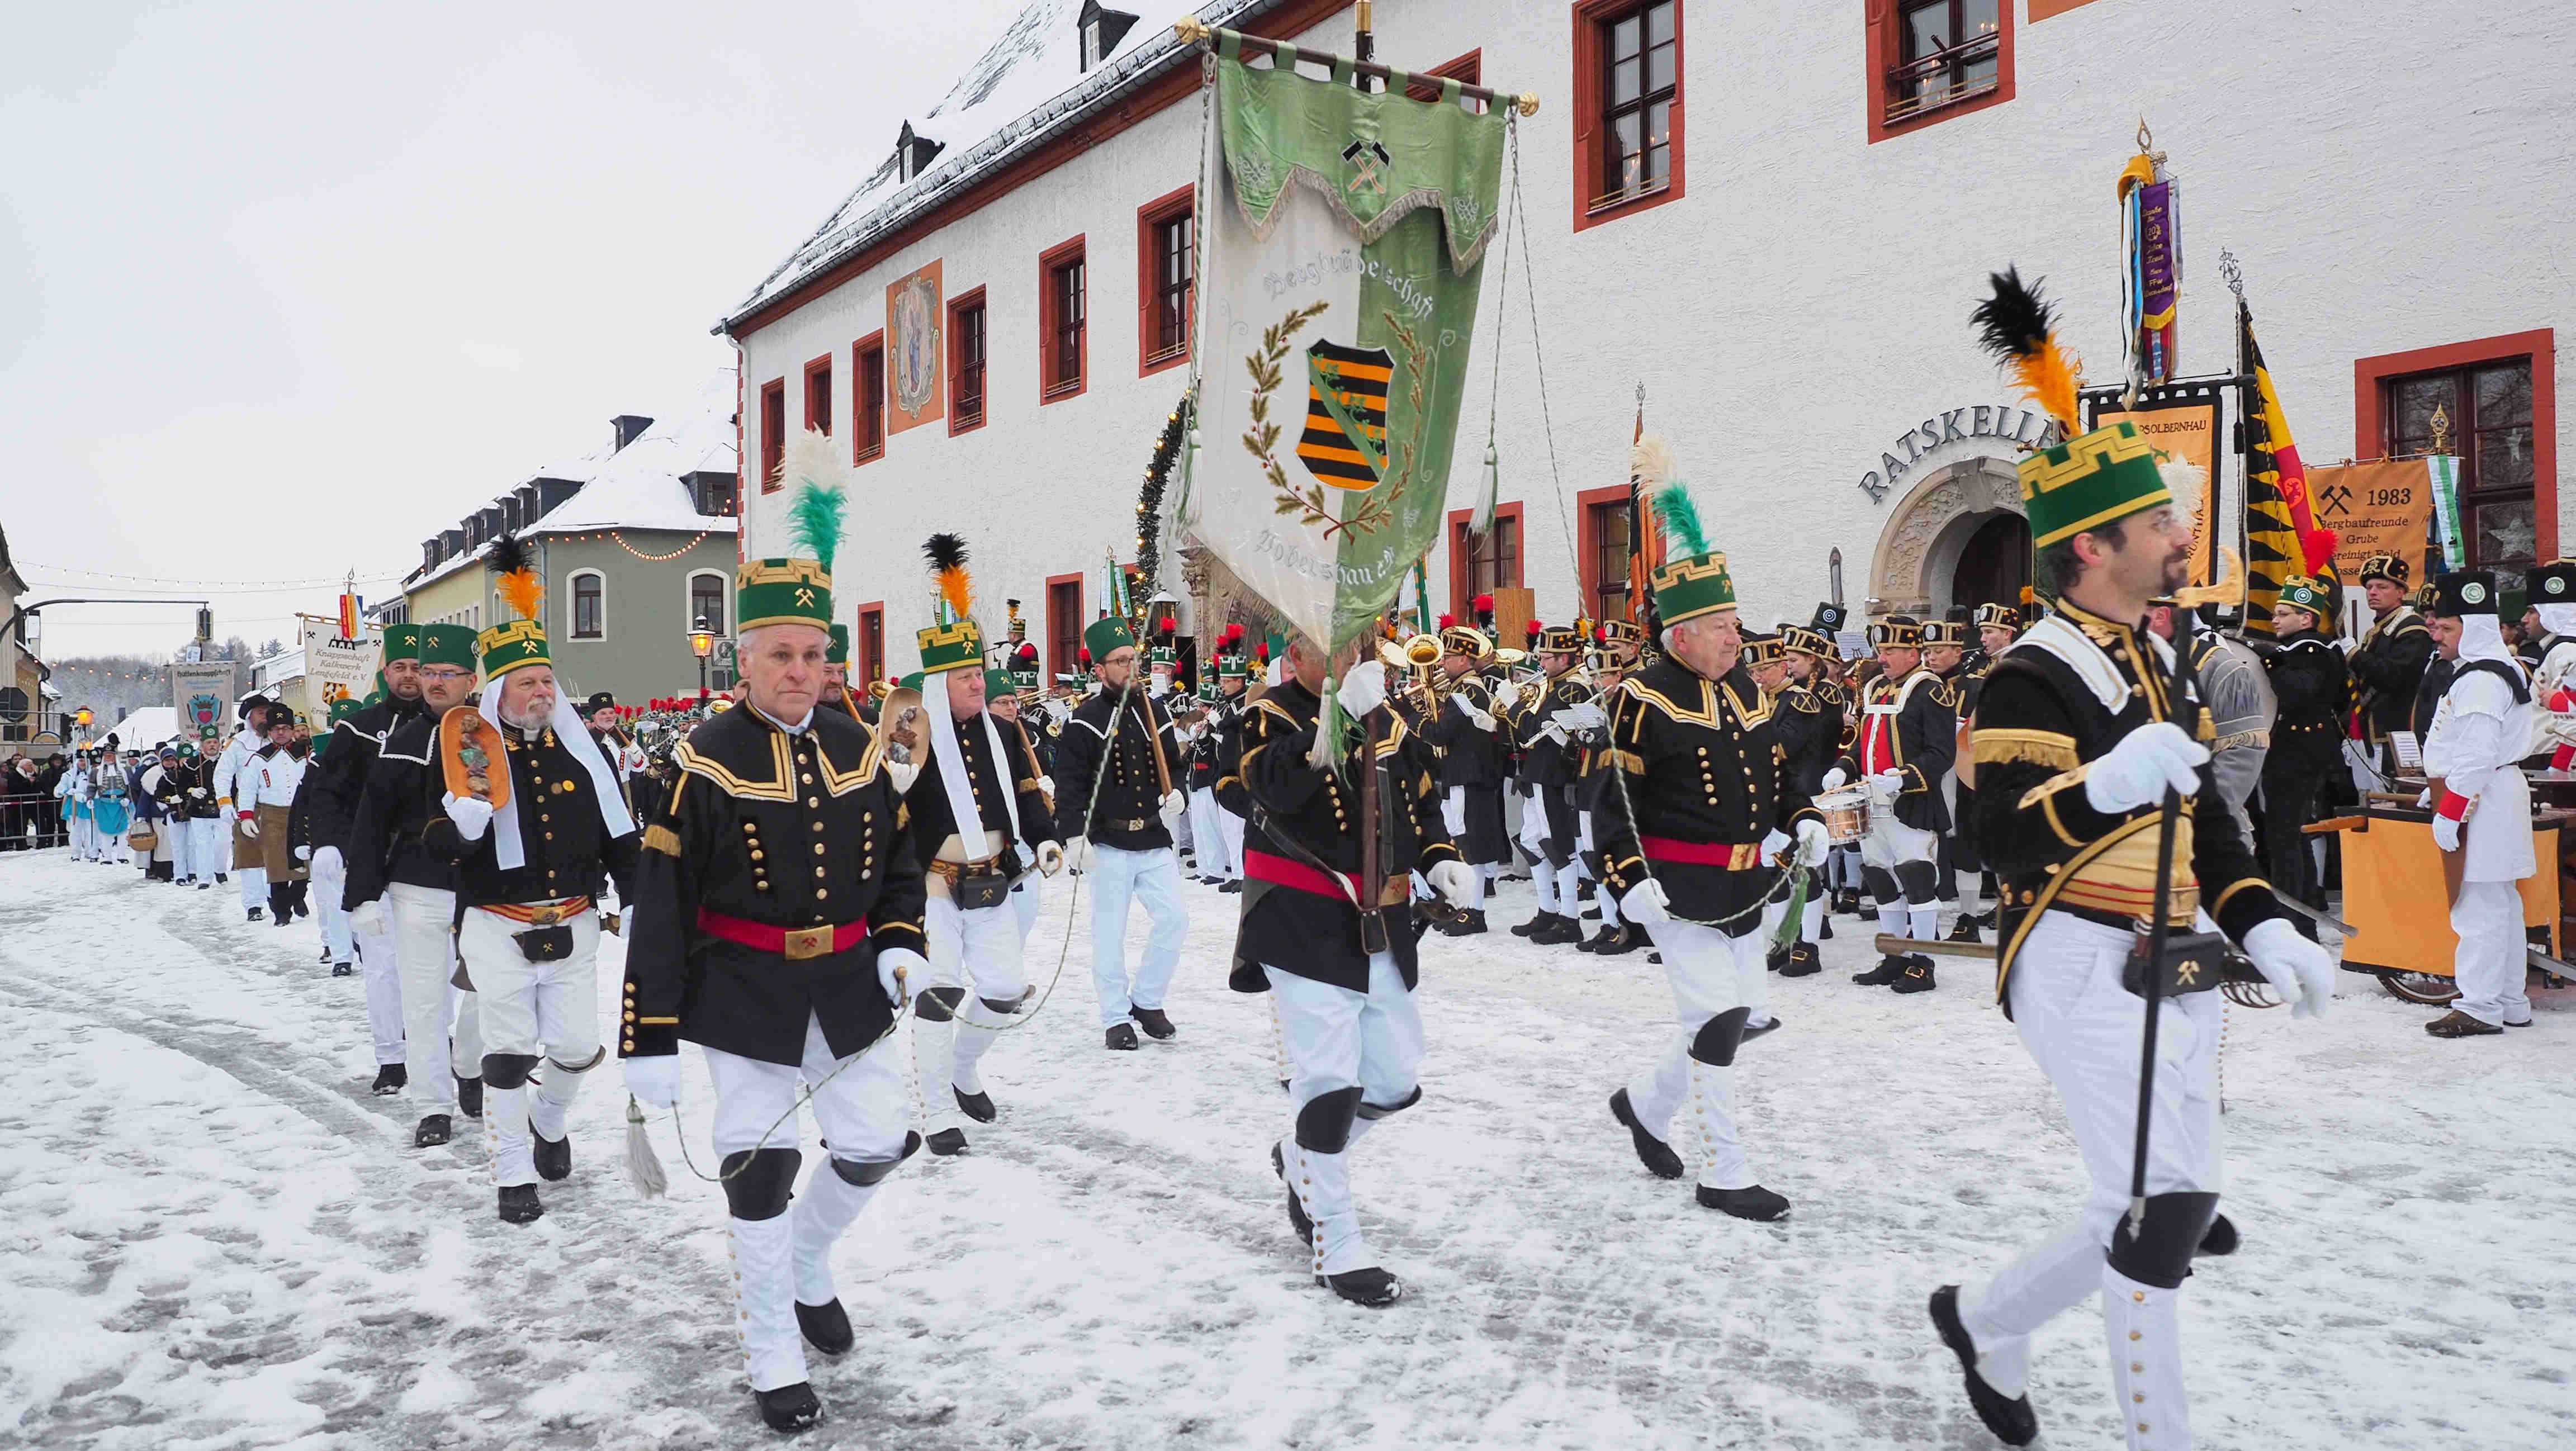 Bergparade Annaberg Buchholz  |  Dieter Knoblauch